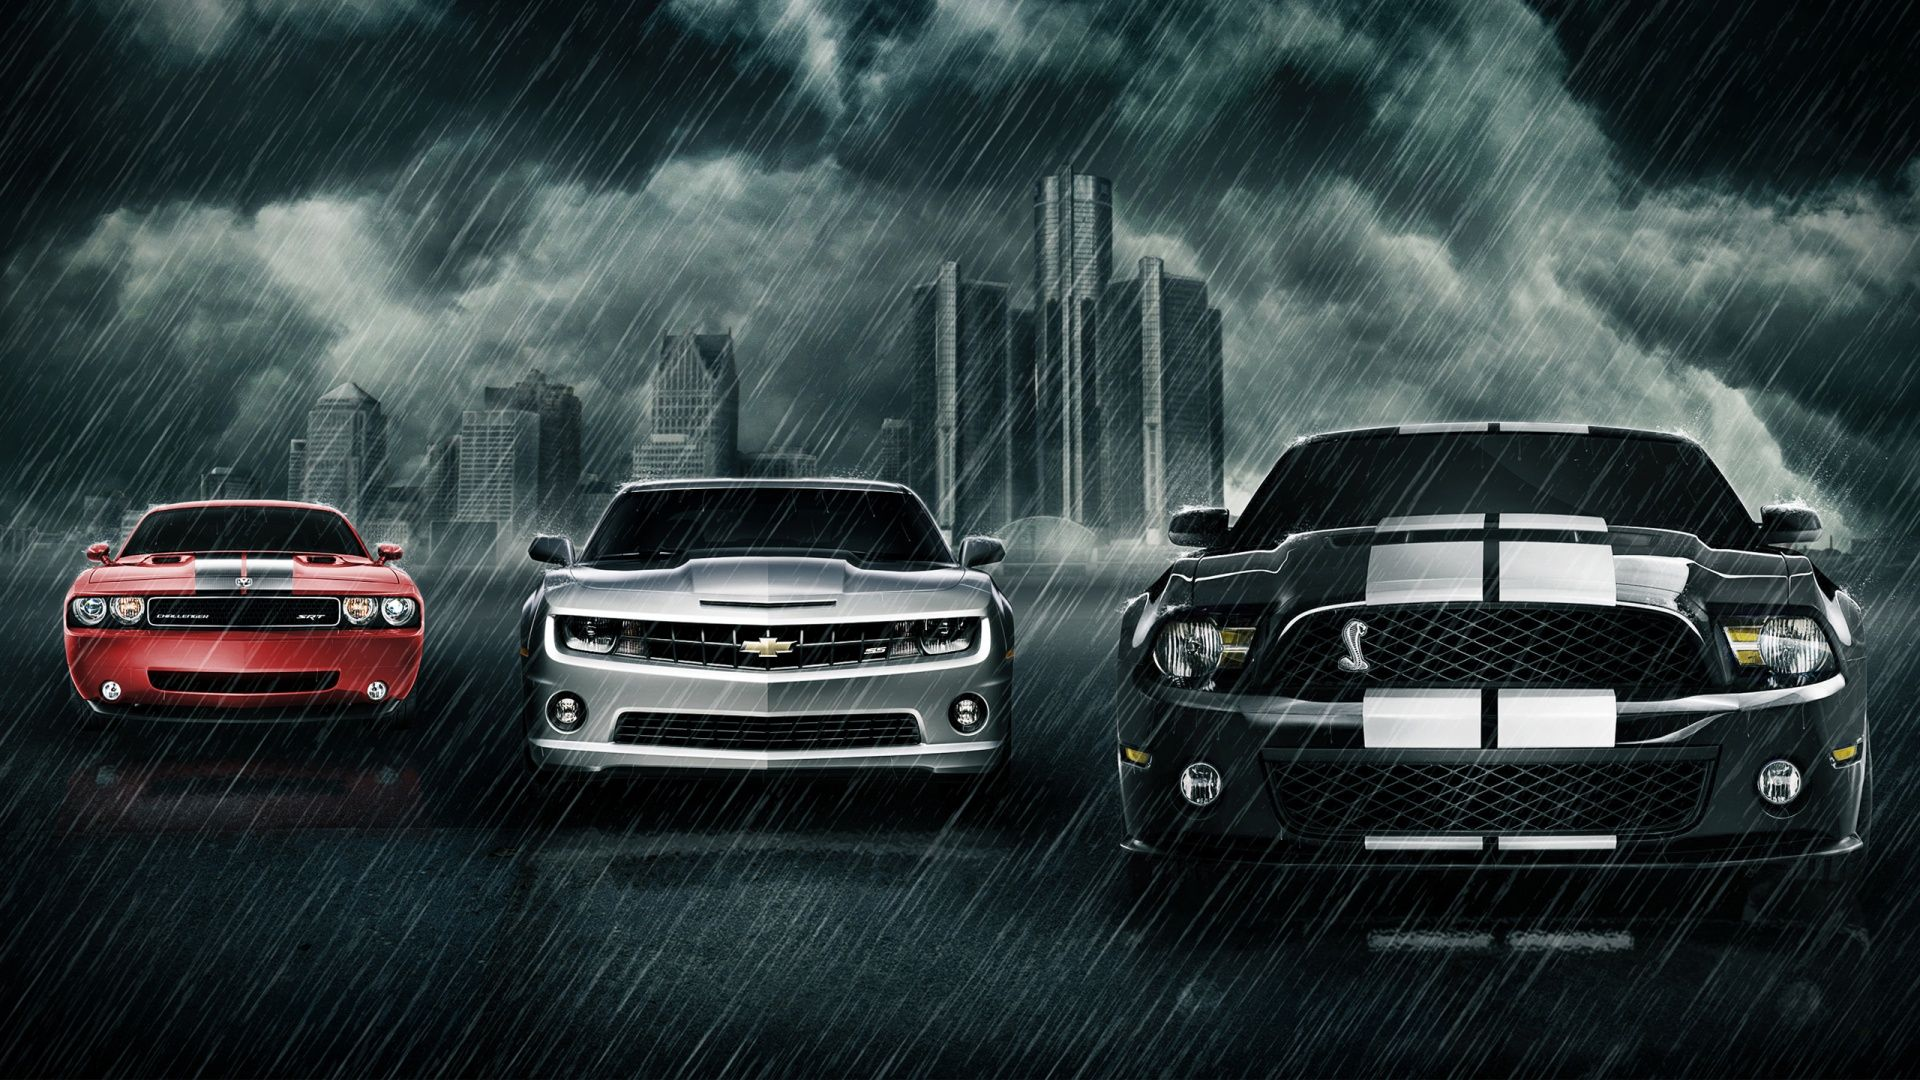 Cool Sports Cars Hd Wallpaper 1080p Hd Desktop Wallpaper